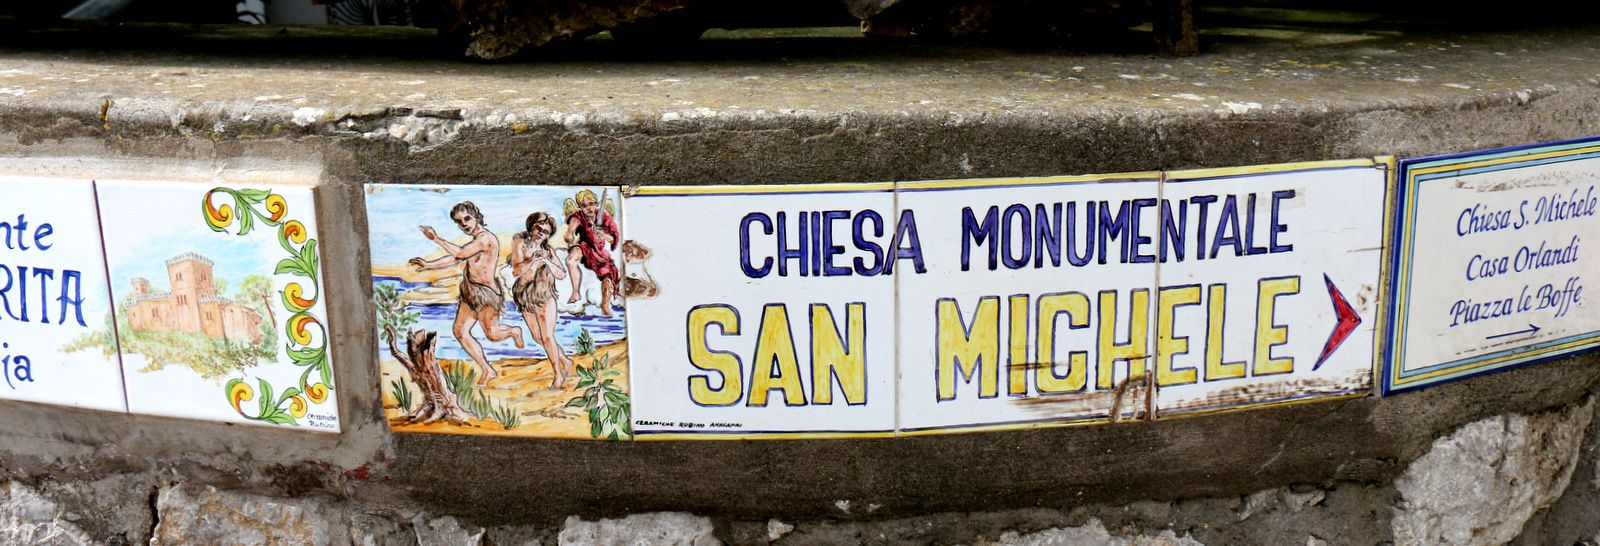 La Casa Rosa et l'église San Michele, Anacapri (Capri)